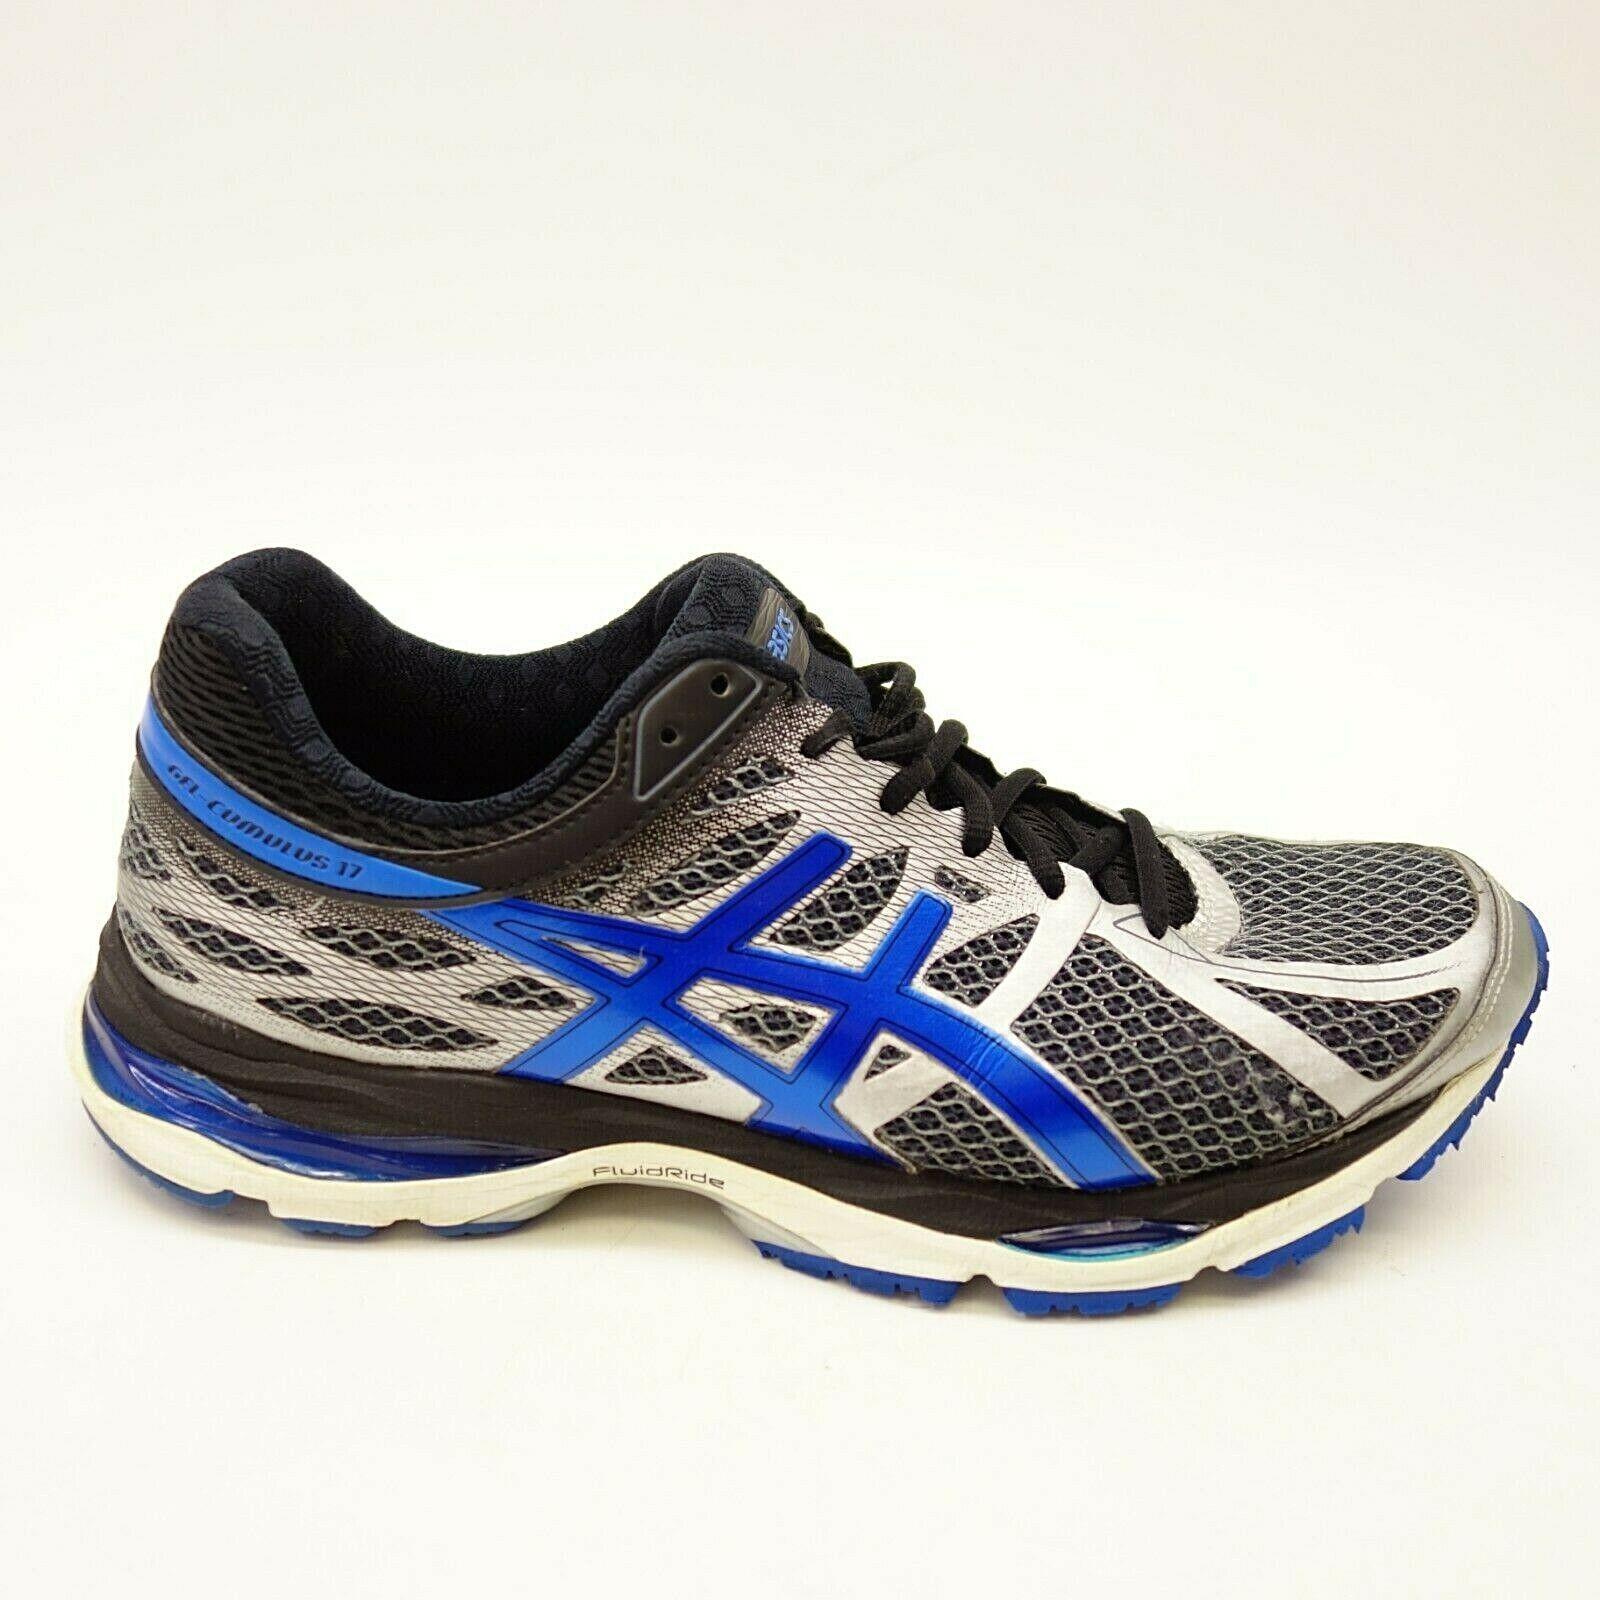 Adidas Sneaker CLIMACOOL, 42 43, US 9, Vintage Sportschuhe